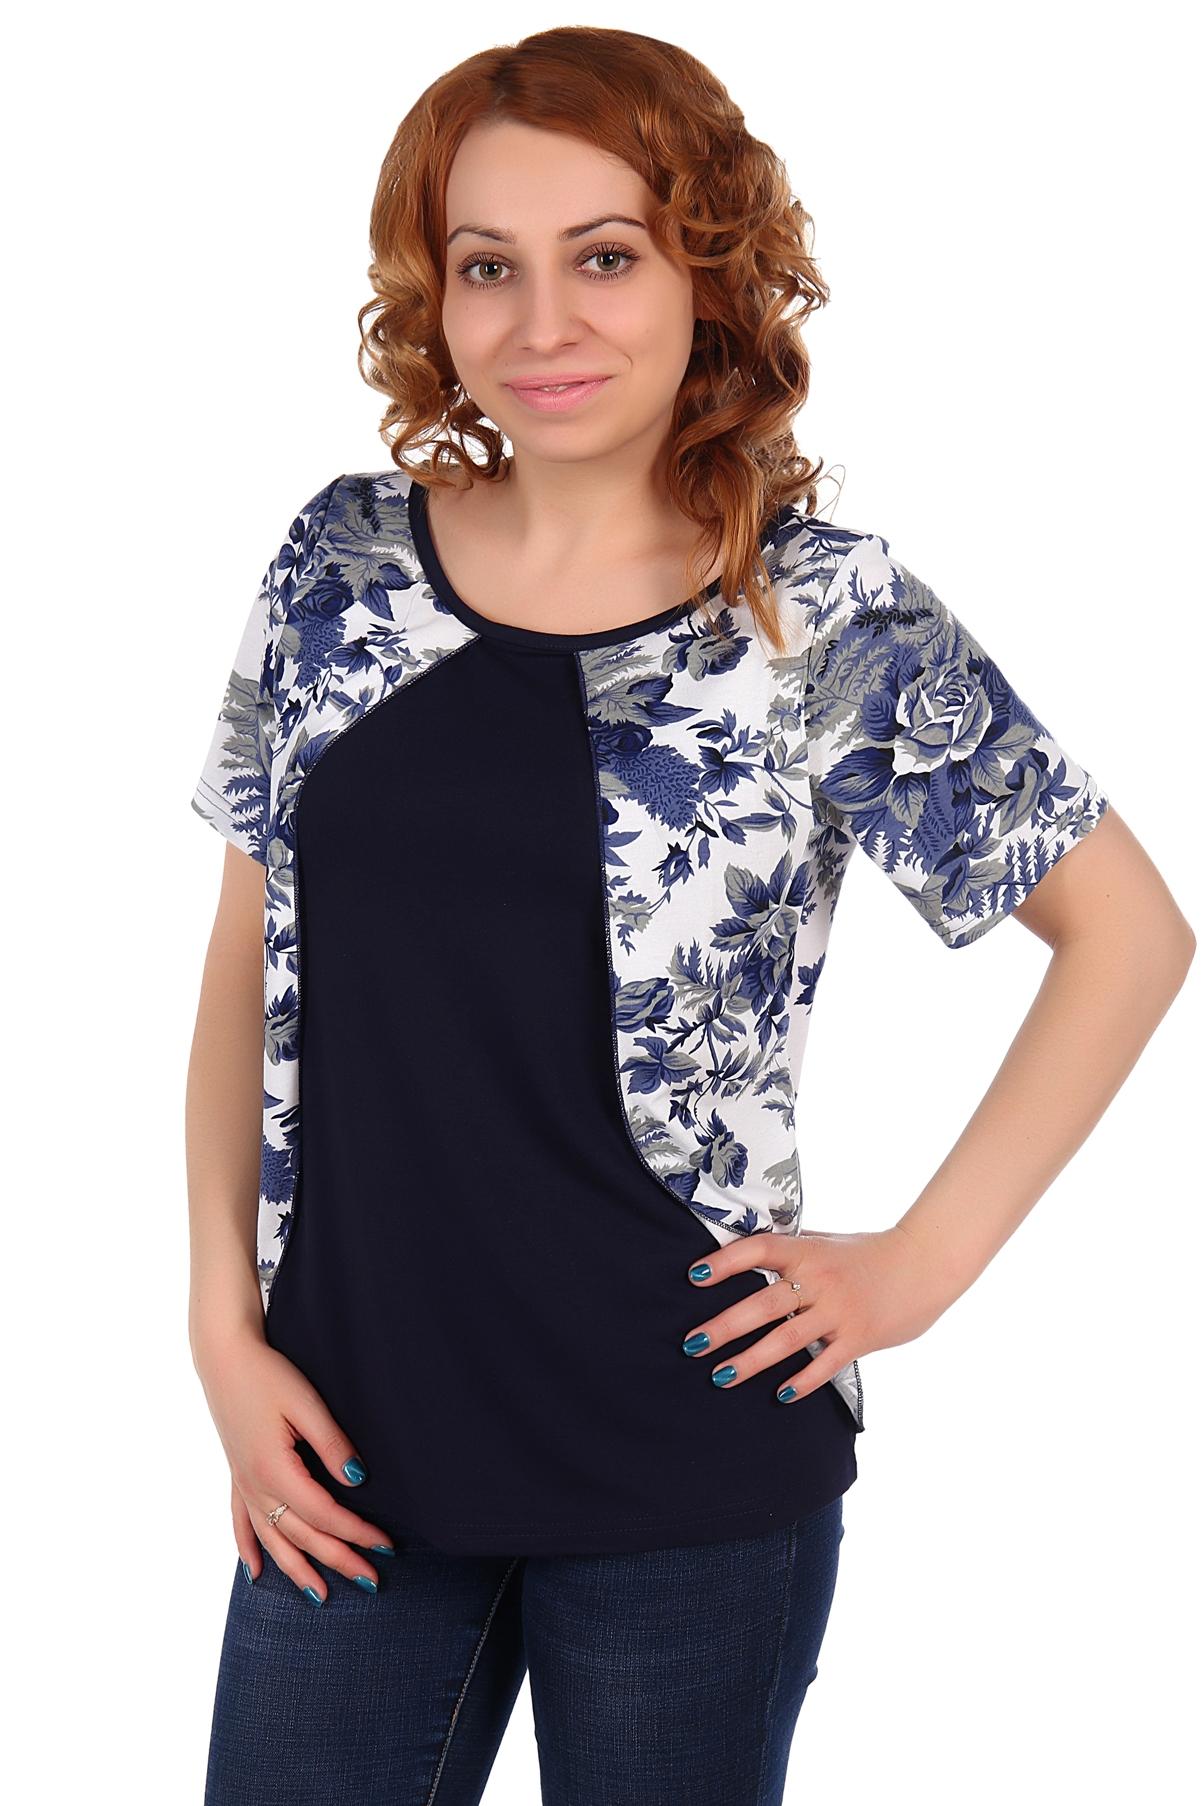 Жен. блуза арт. 16-0105 Синий р. 54Блузы<br>Факт. ОГ: 104 см <br>Факт. ОТ: 104 см <br>Факт. ОБ: 112 см <br>Длина по спинке: 64 см<br><br>Тип: Жен. блуза<br>Размер: 54<br>Материал: Вискоза